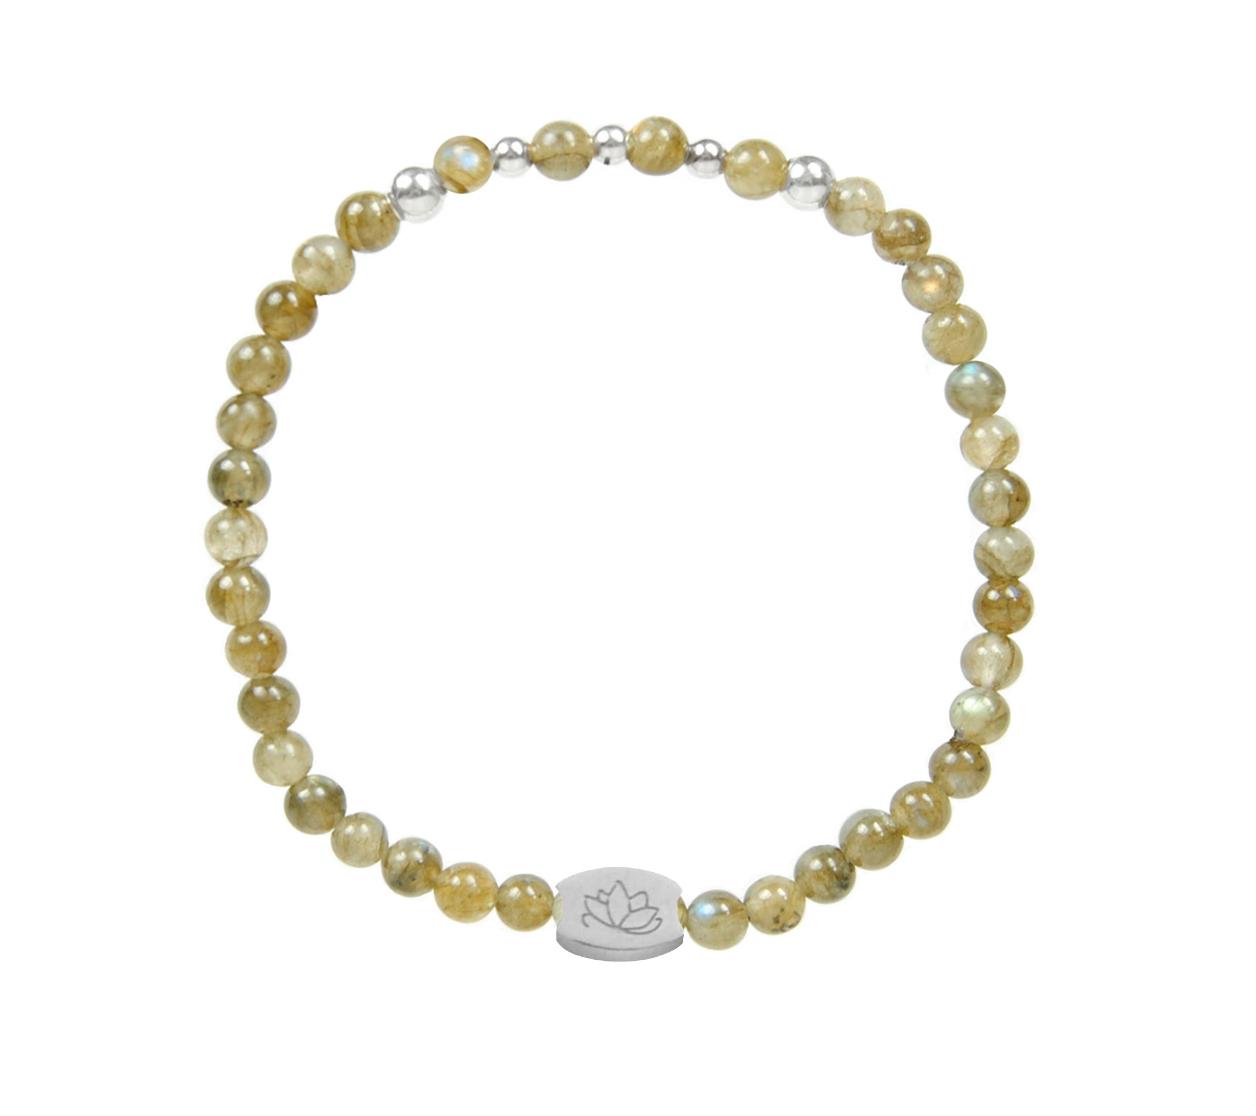 Armbaender für Frauen - MAS jewelz Armband Labradorit Silber 4mm  - Onlineshop Tante Emmer